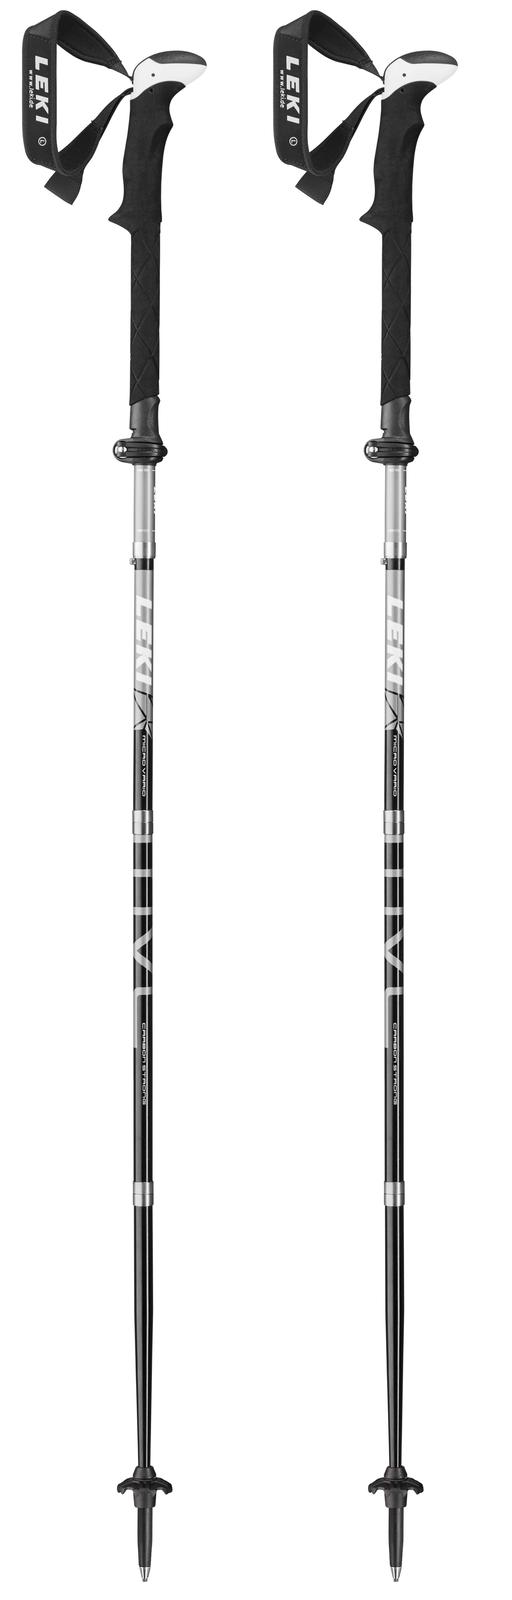 Leki Micro Vario Carbon Strong - Art.Nr. Art.Nr. Art.Nr. 6492980 500373